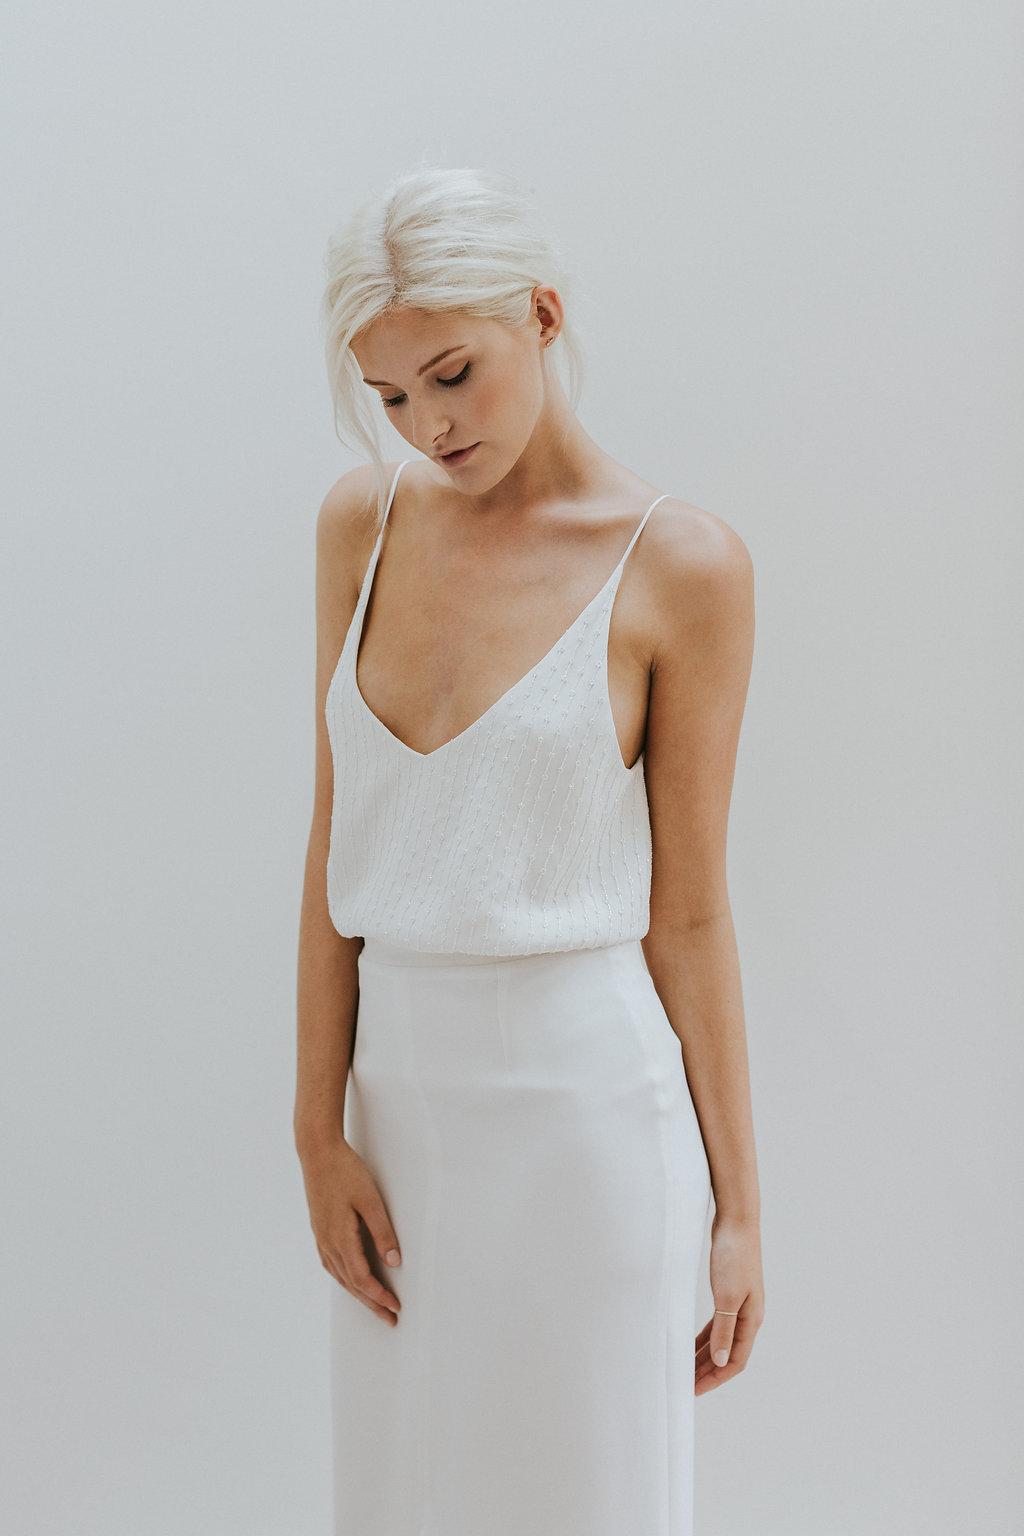 Charlotte Simpson Bridal Made To Order Dresses Bridal